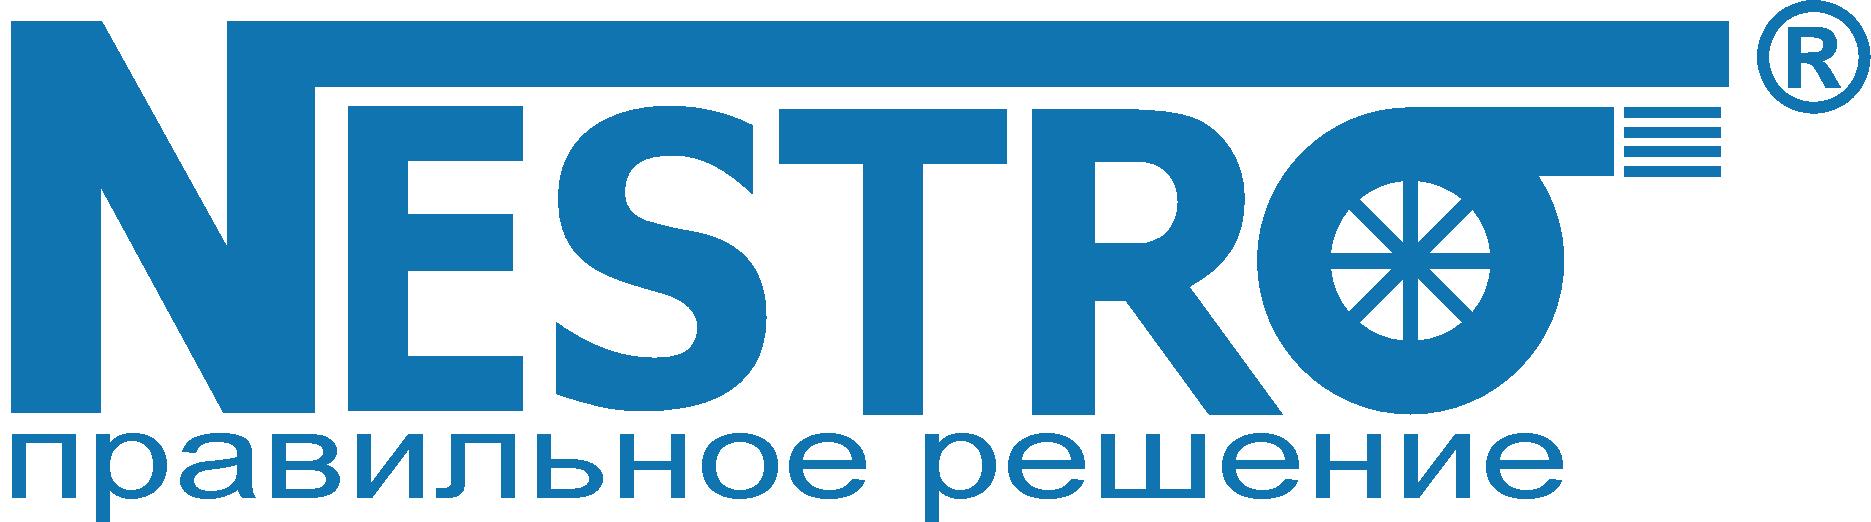 NESTRO Россия